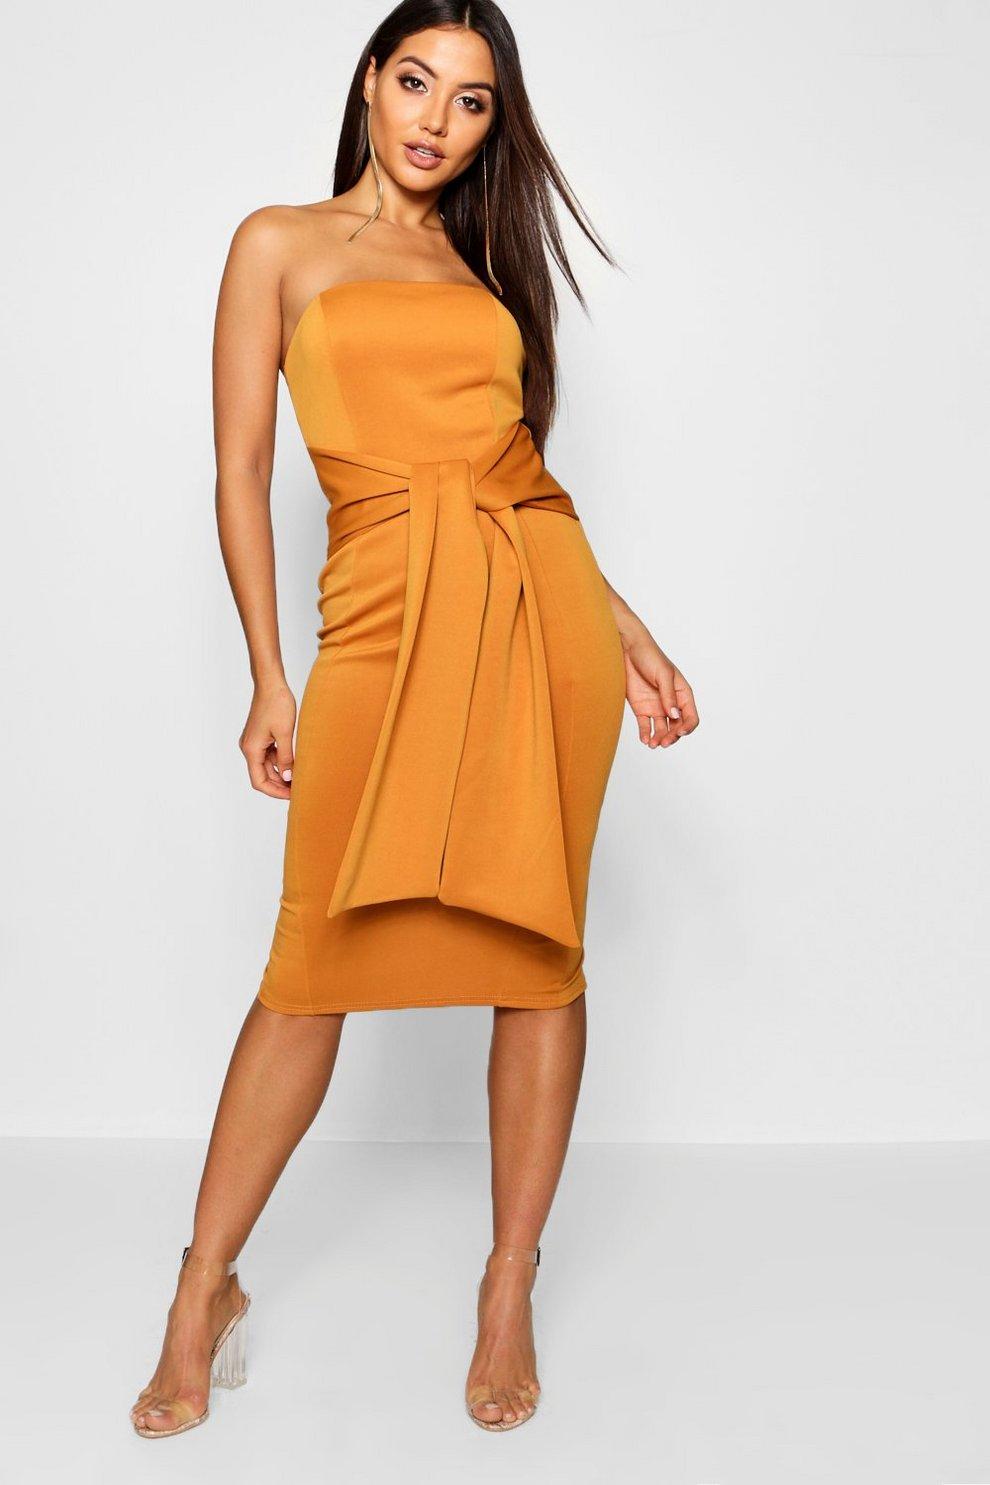 dcfd0611d98 Bandeau Belted Midi Dress